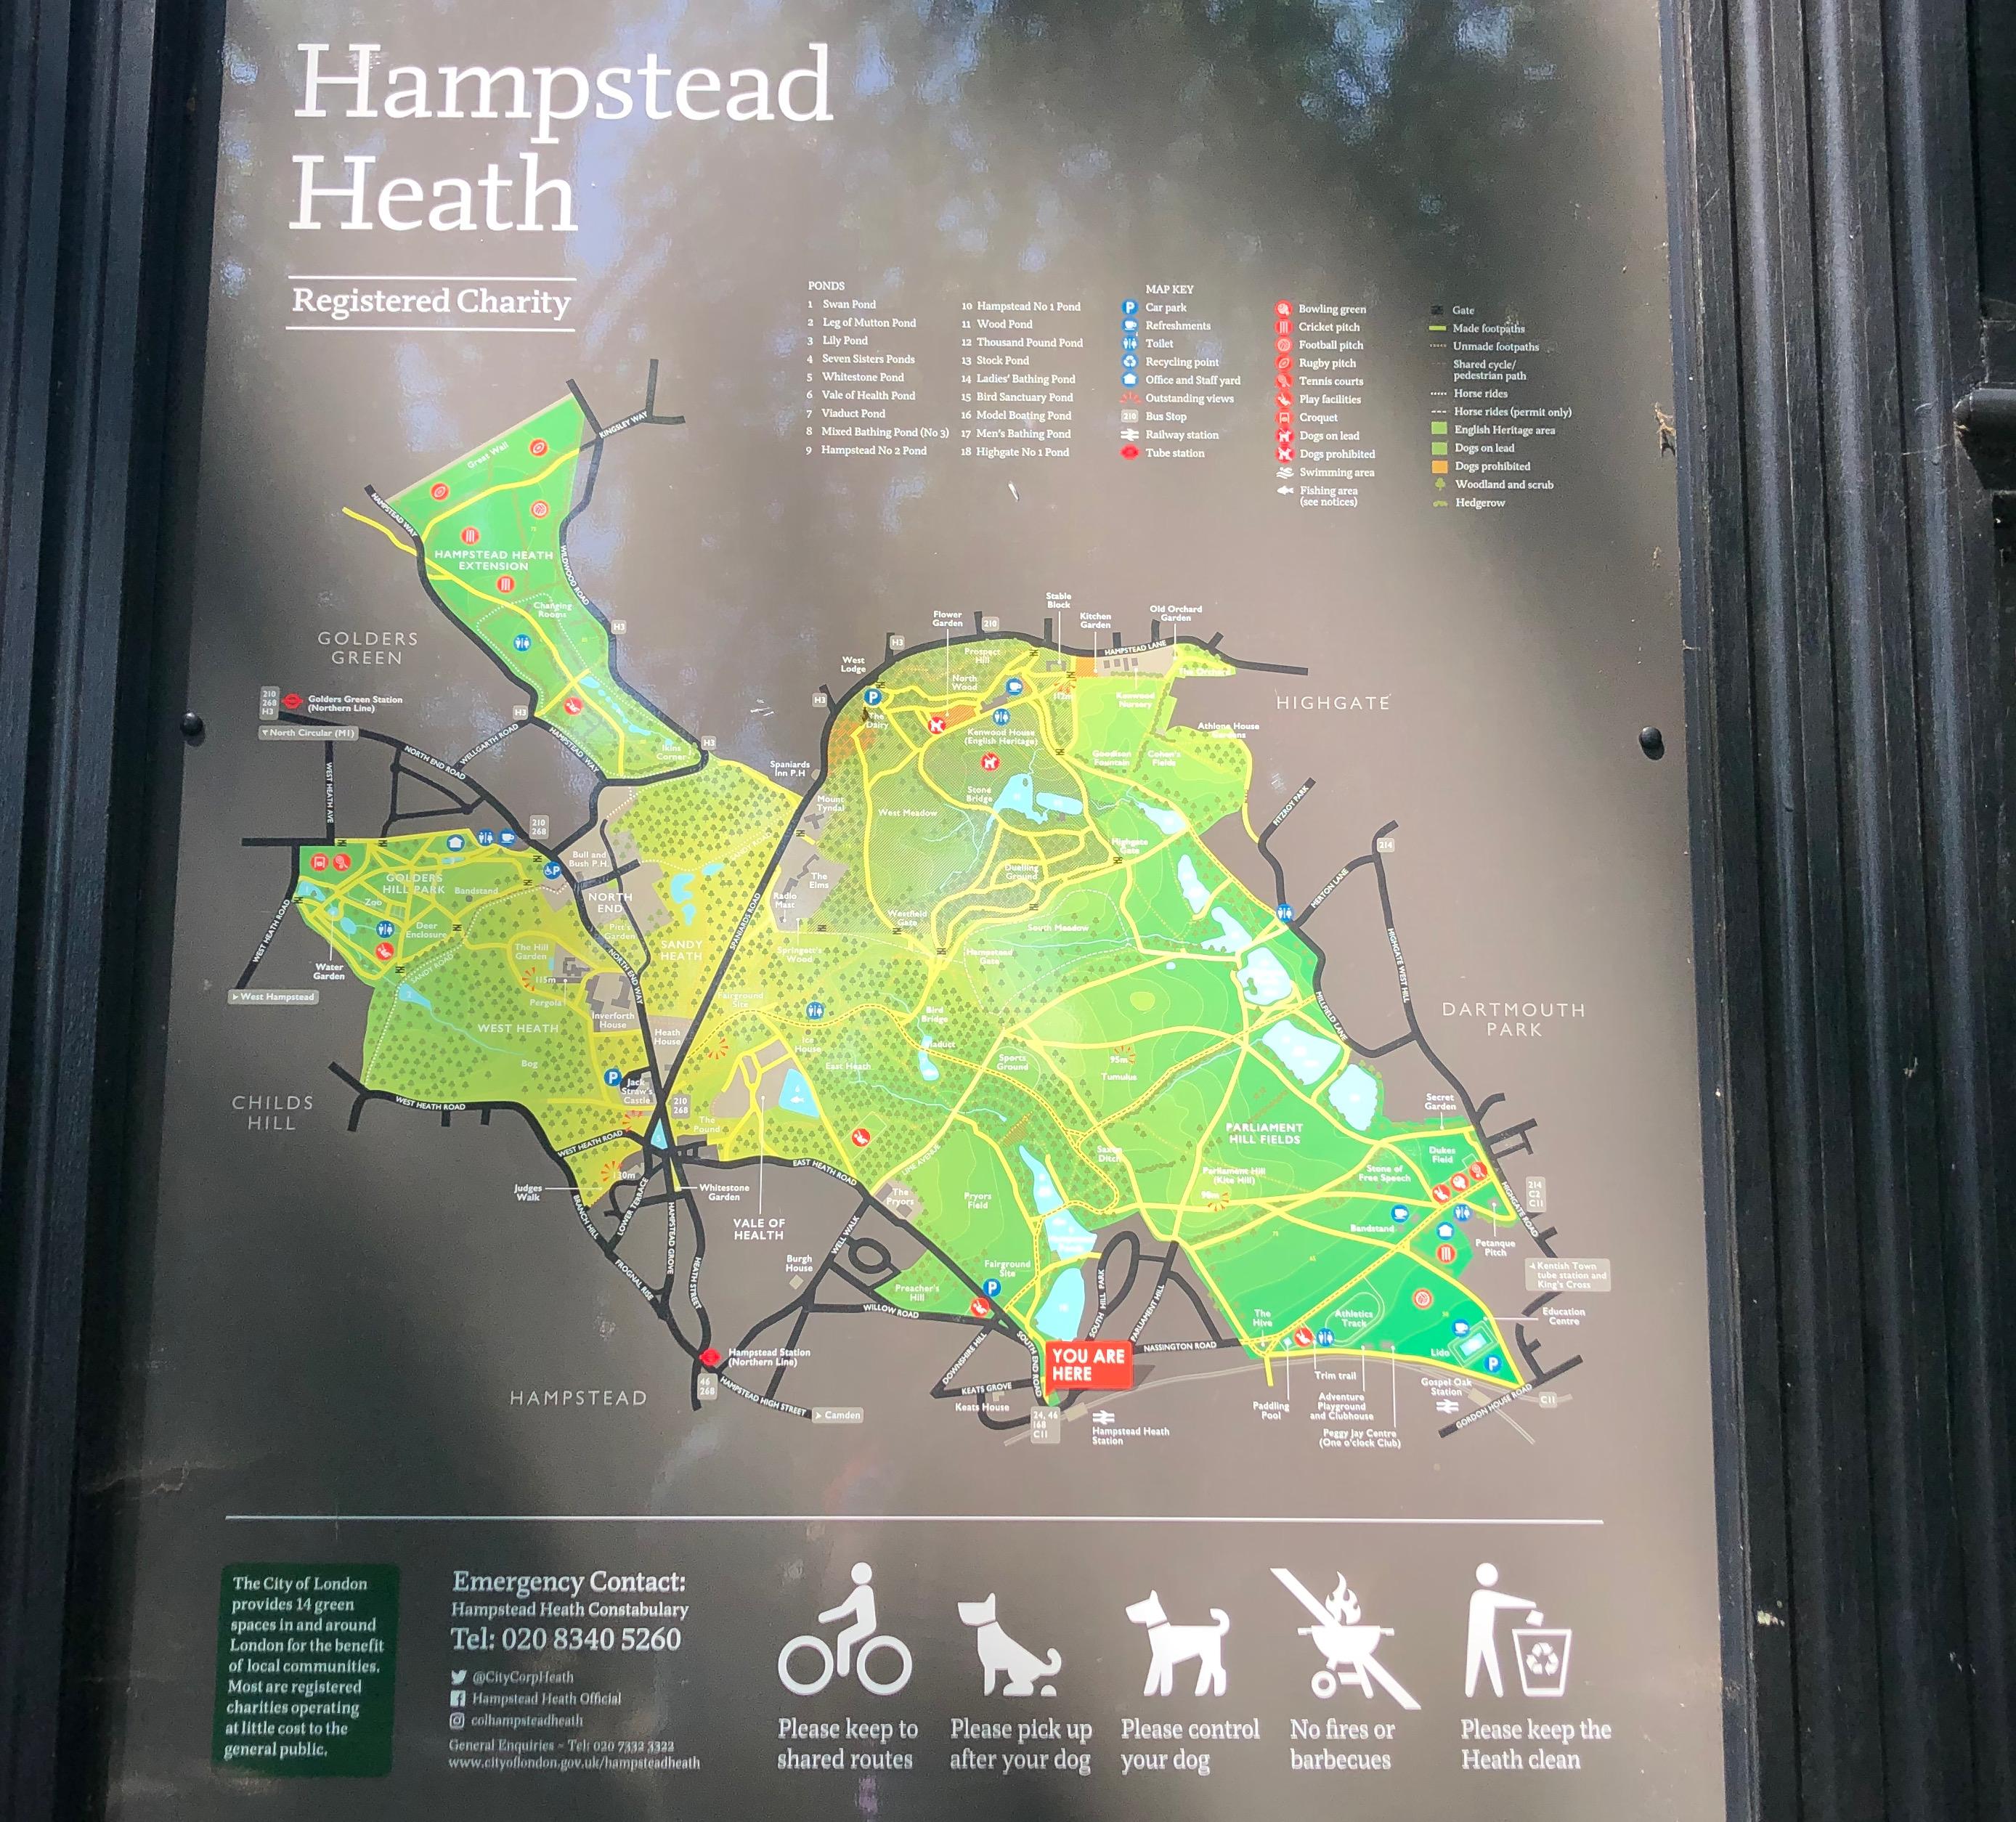 map of hampstead heath